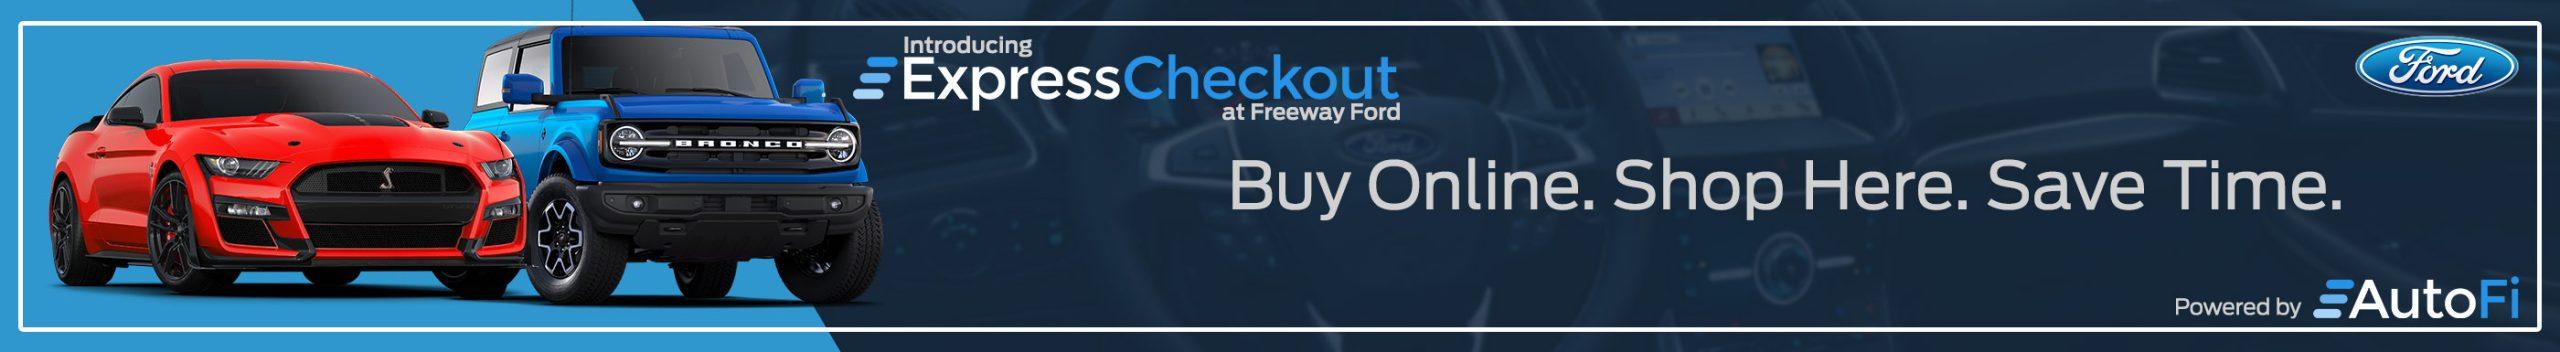 Freeway Ford Autofi Srp